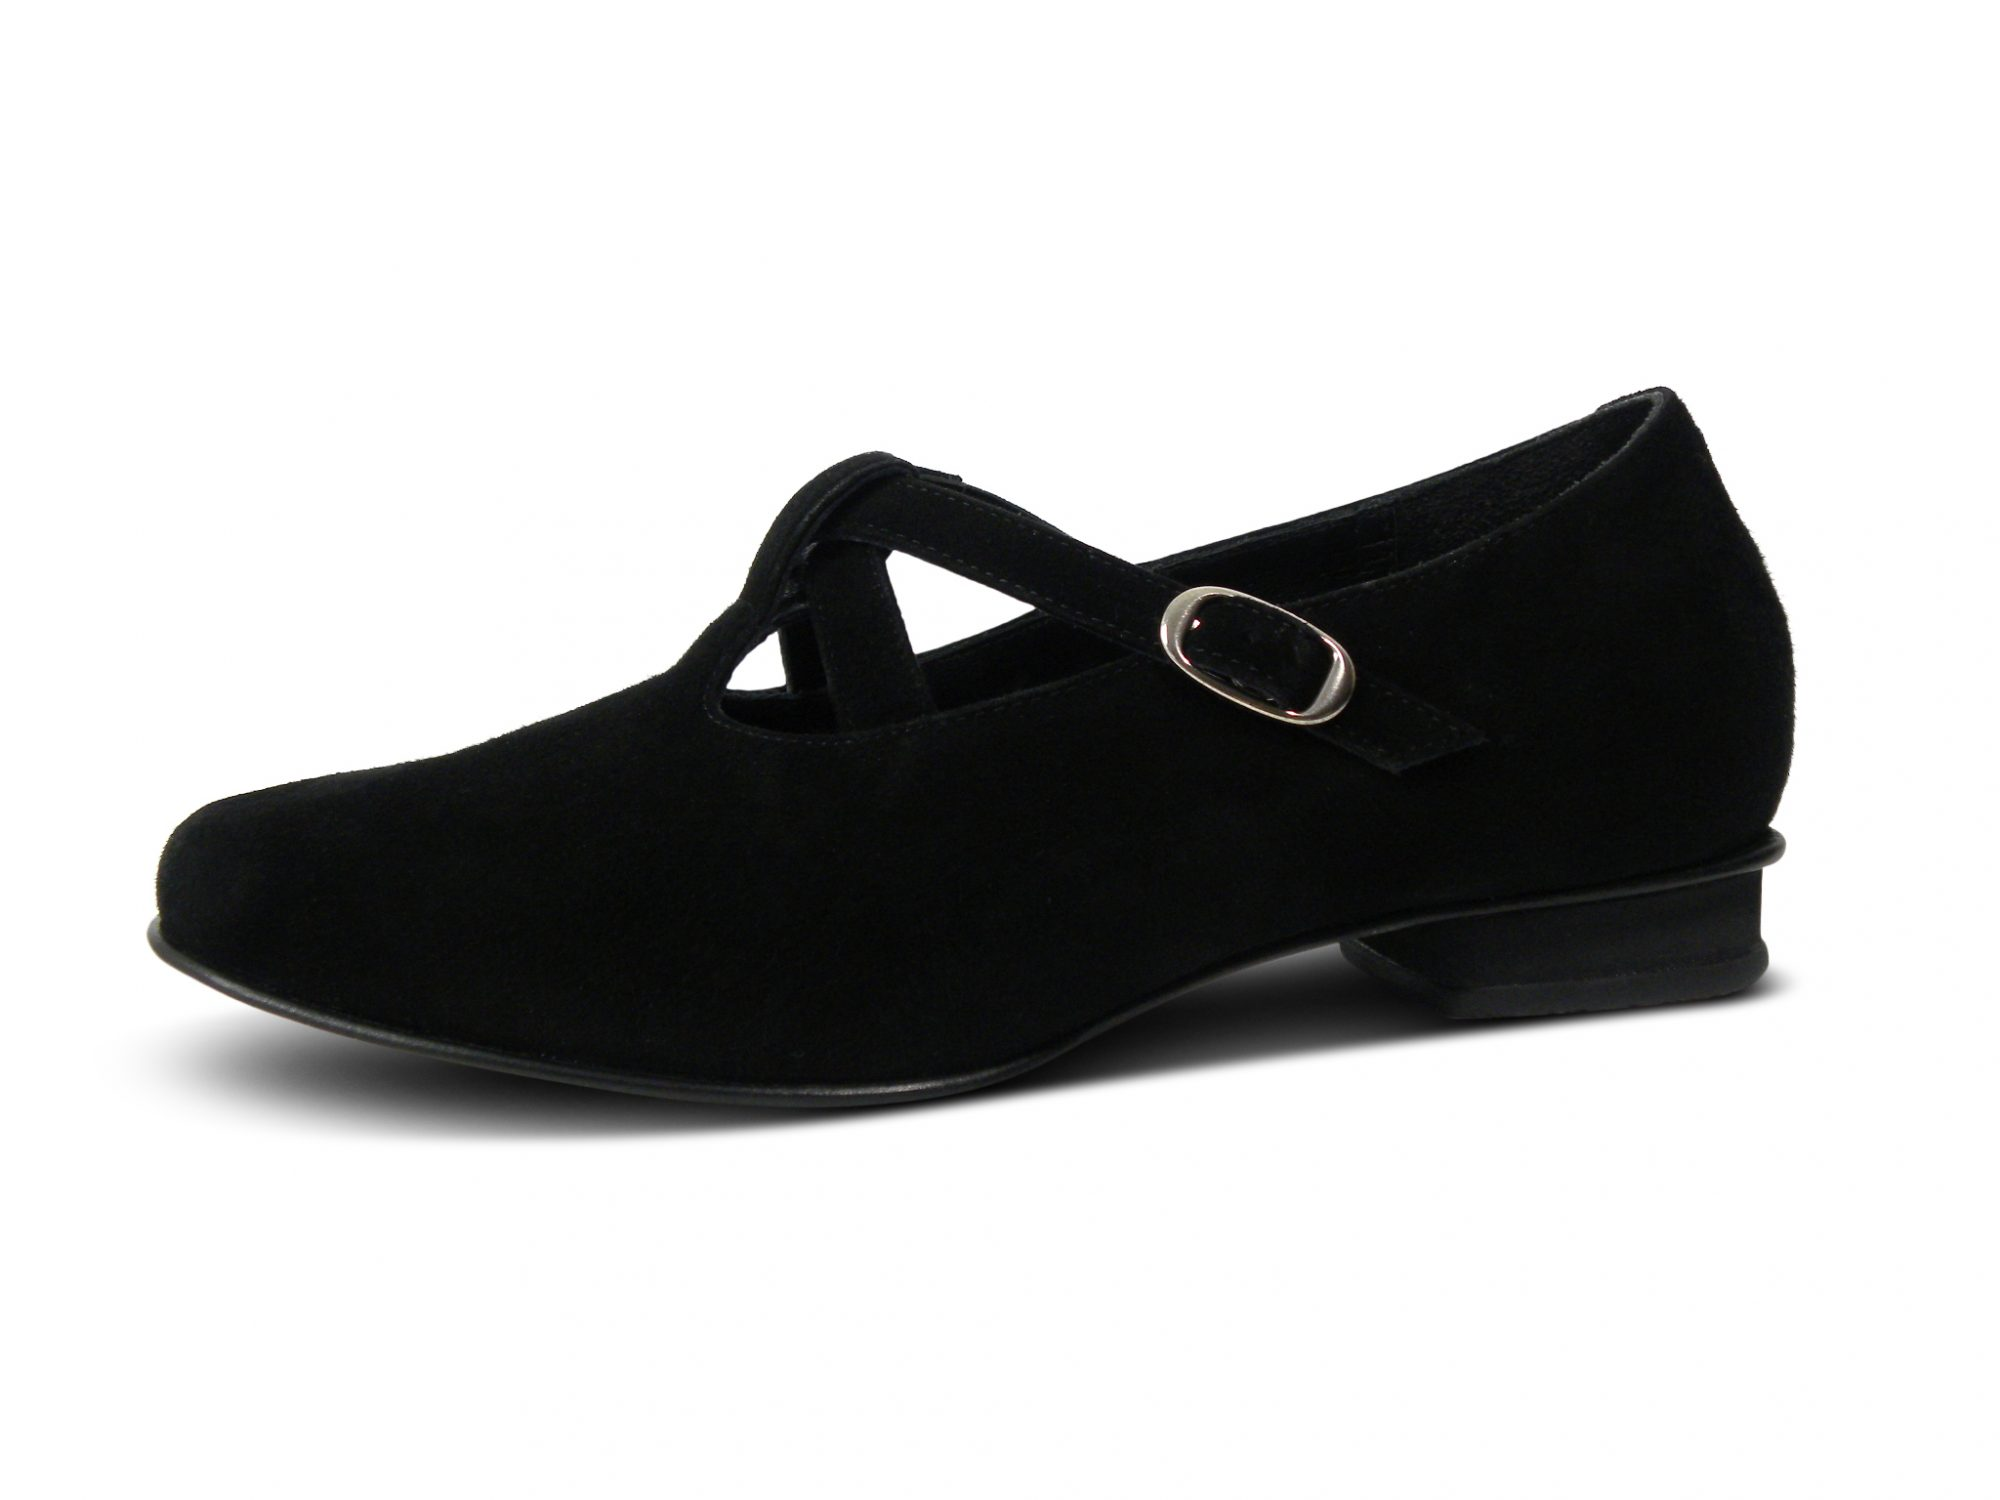 Riemchenballerina mit Fußbett, Veloursleder